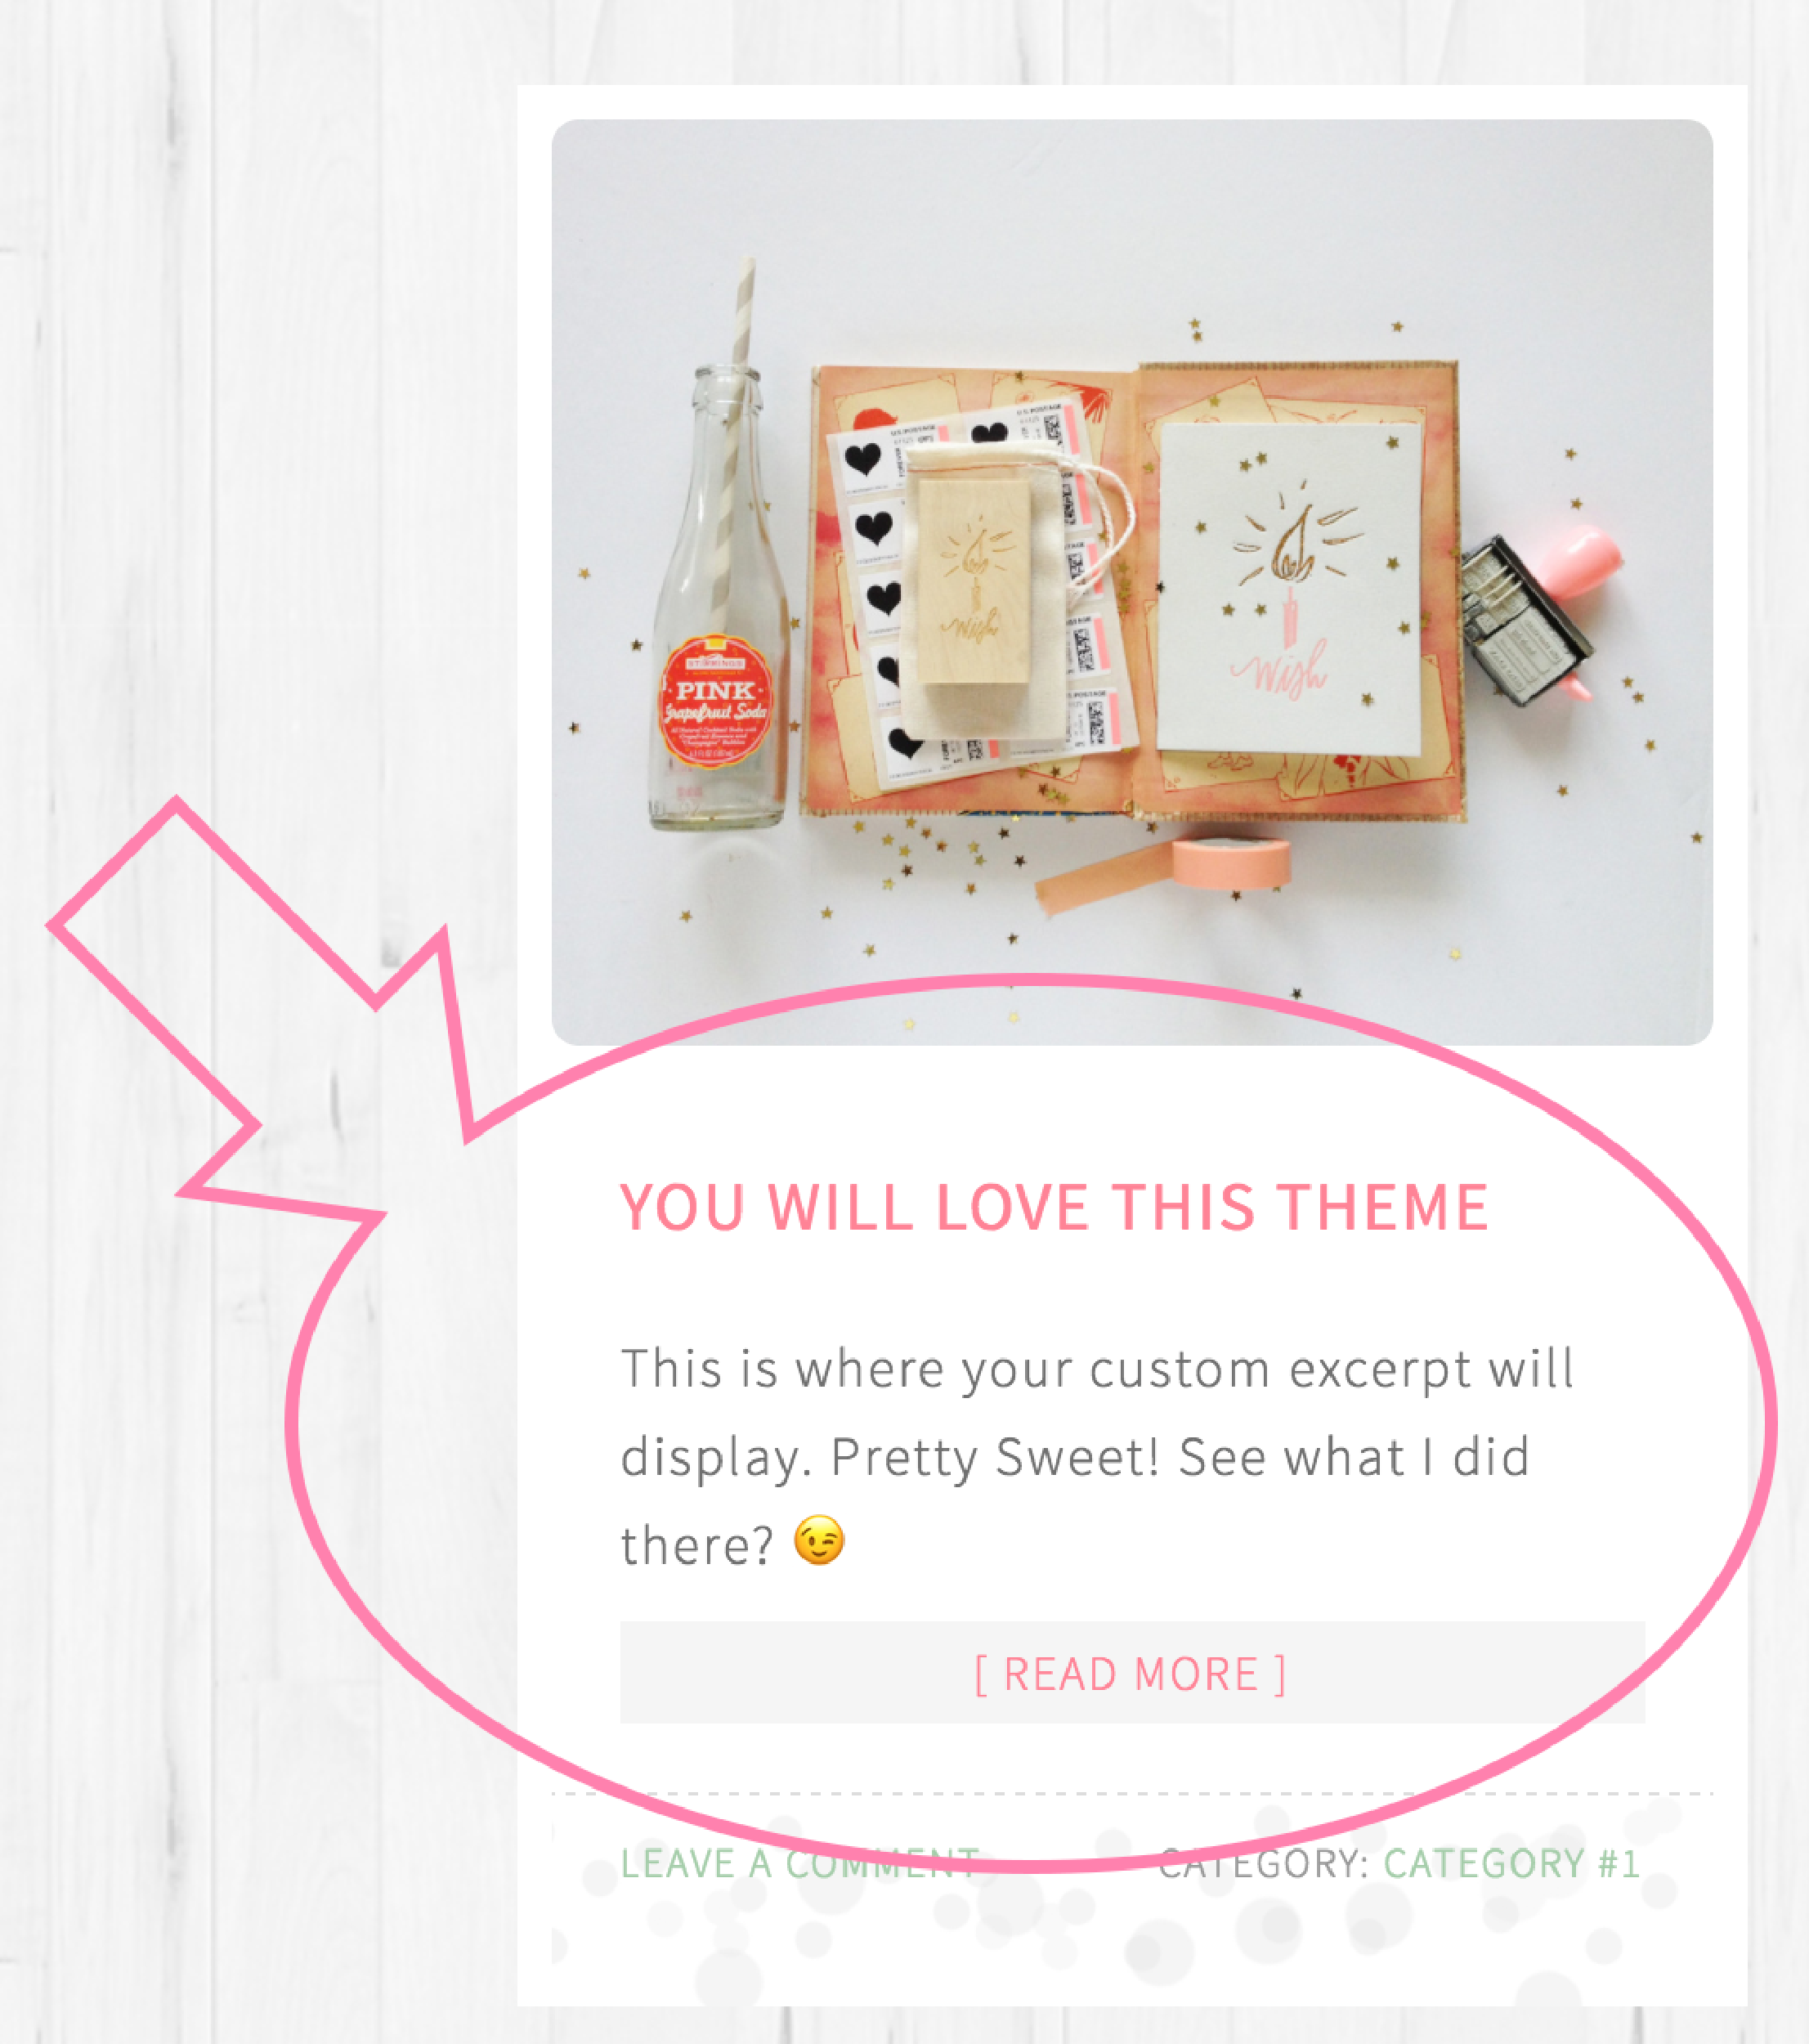 Pretty Sweet Theme Custom Excerpts